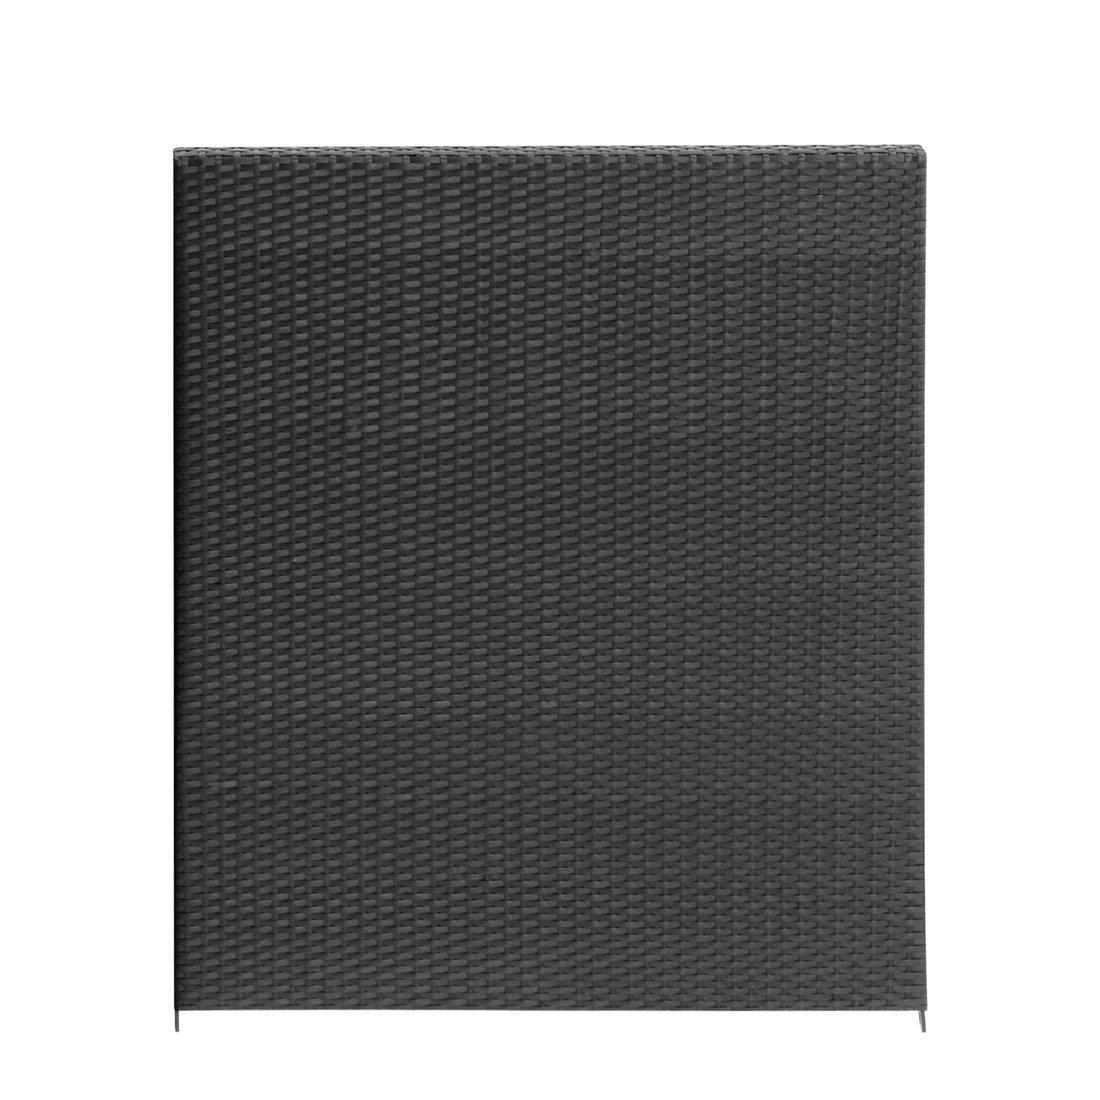 Gartenfreude Polyrattan Zaun Element 180 x 180 cm, 1 Stück, anthrazit, 2550-1015-001